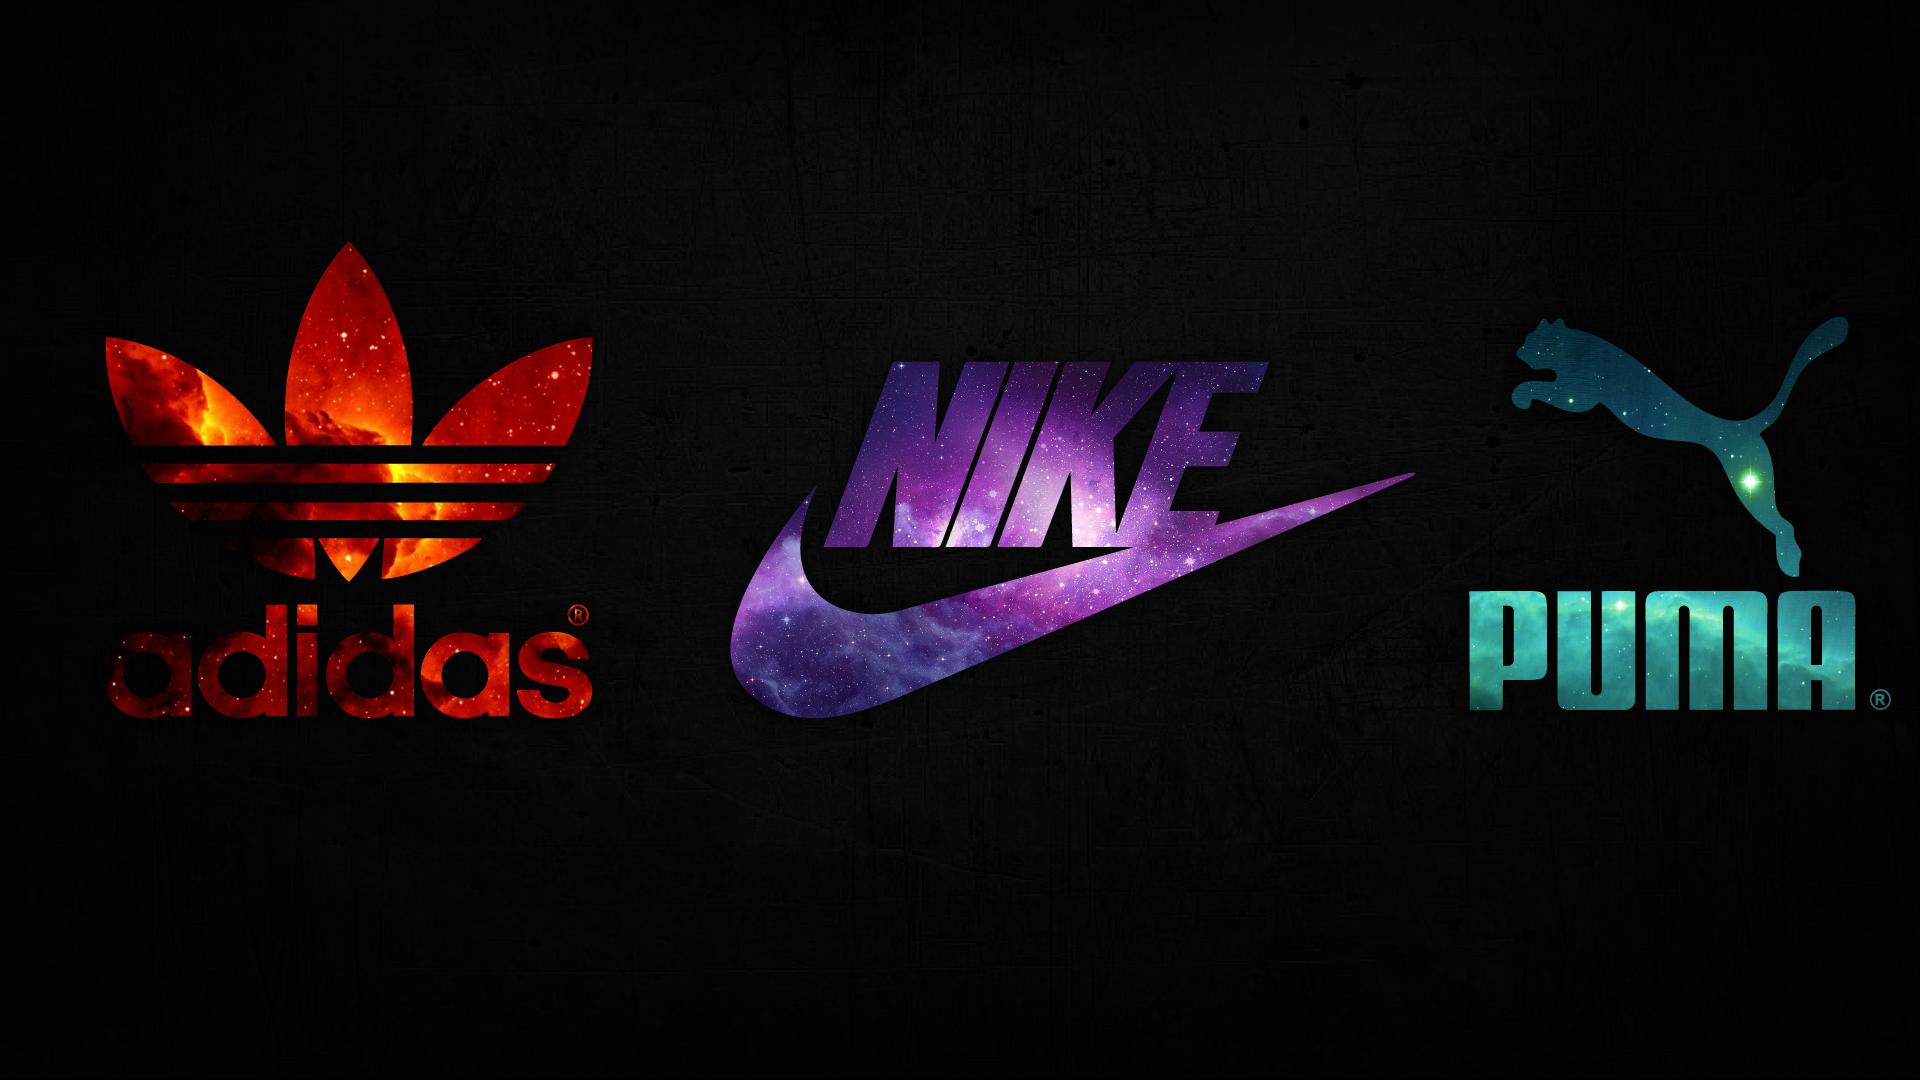 General 1920x1080 Nike Adidas Puma space logo red purple turquoise black background